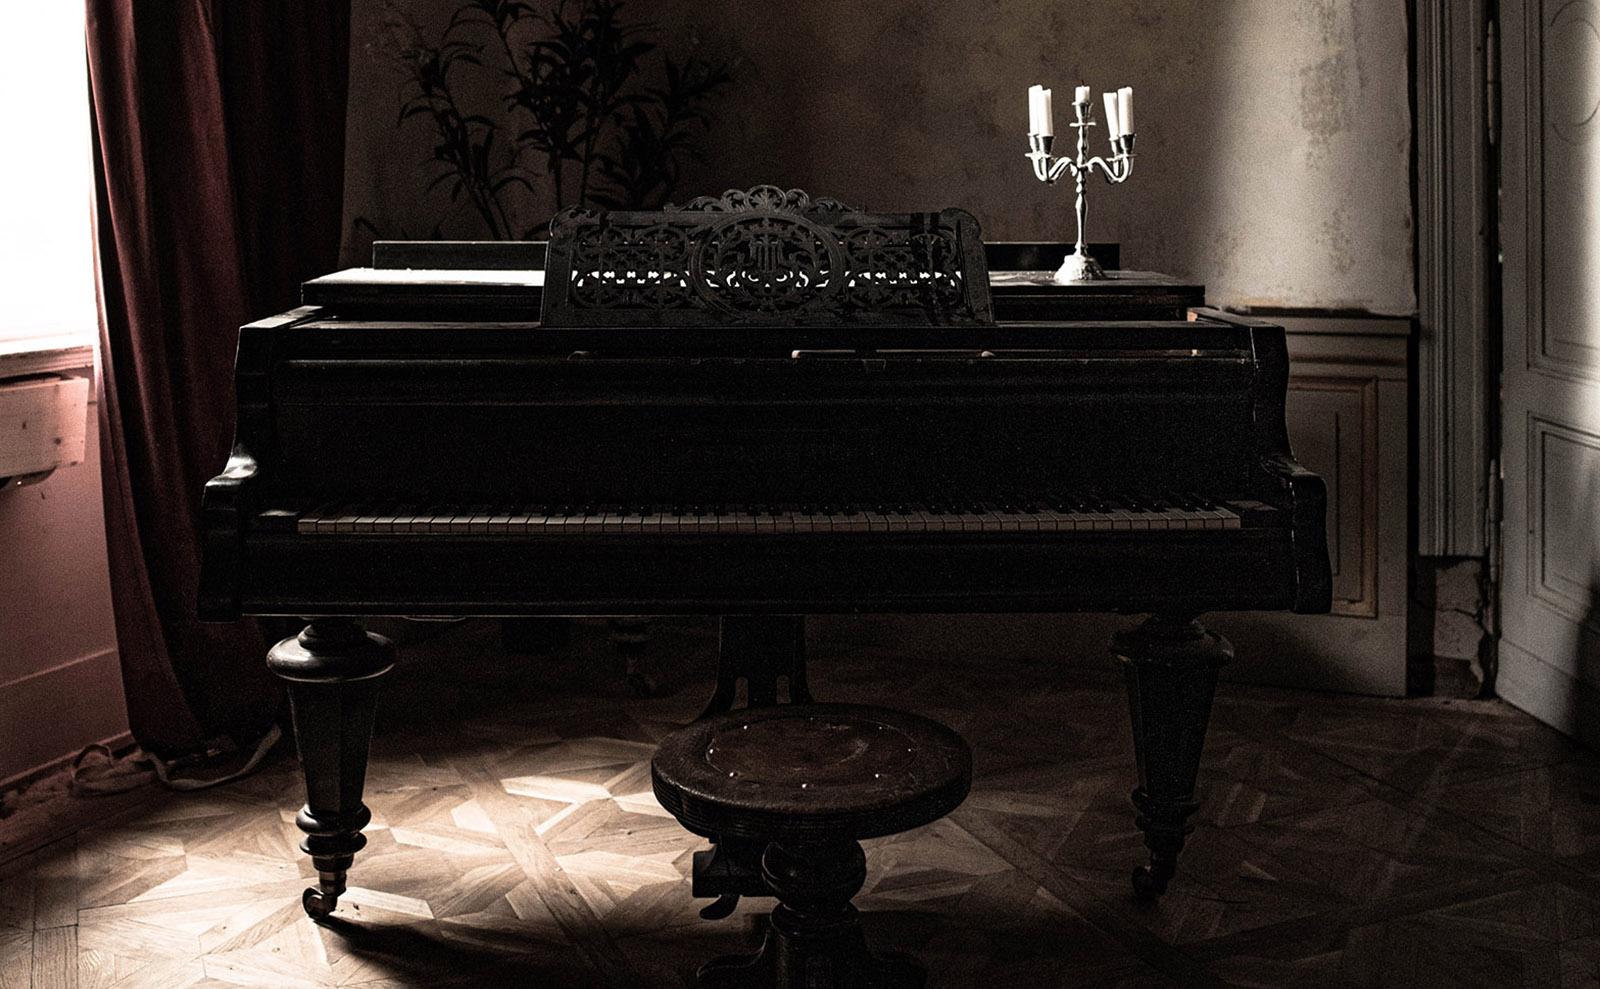 creepy piano with a candelabra